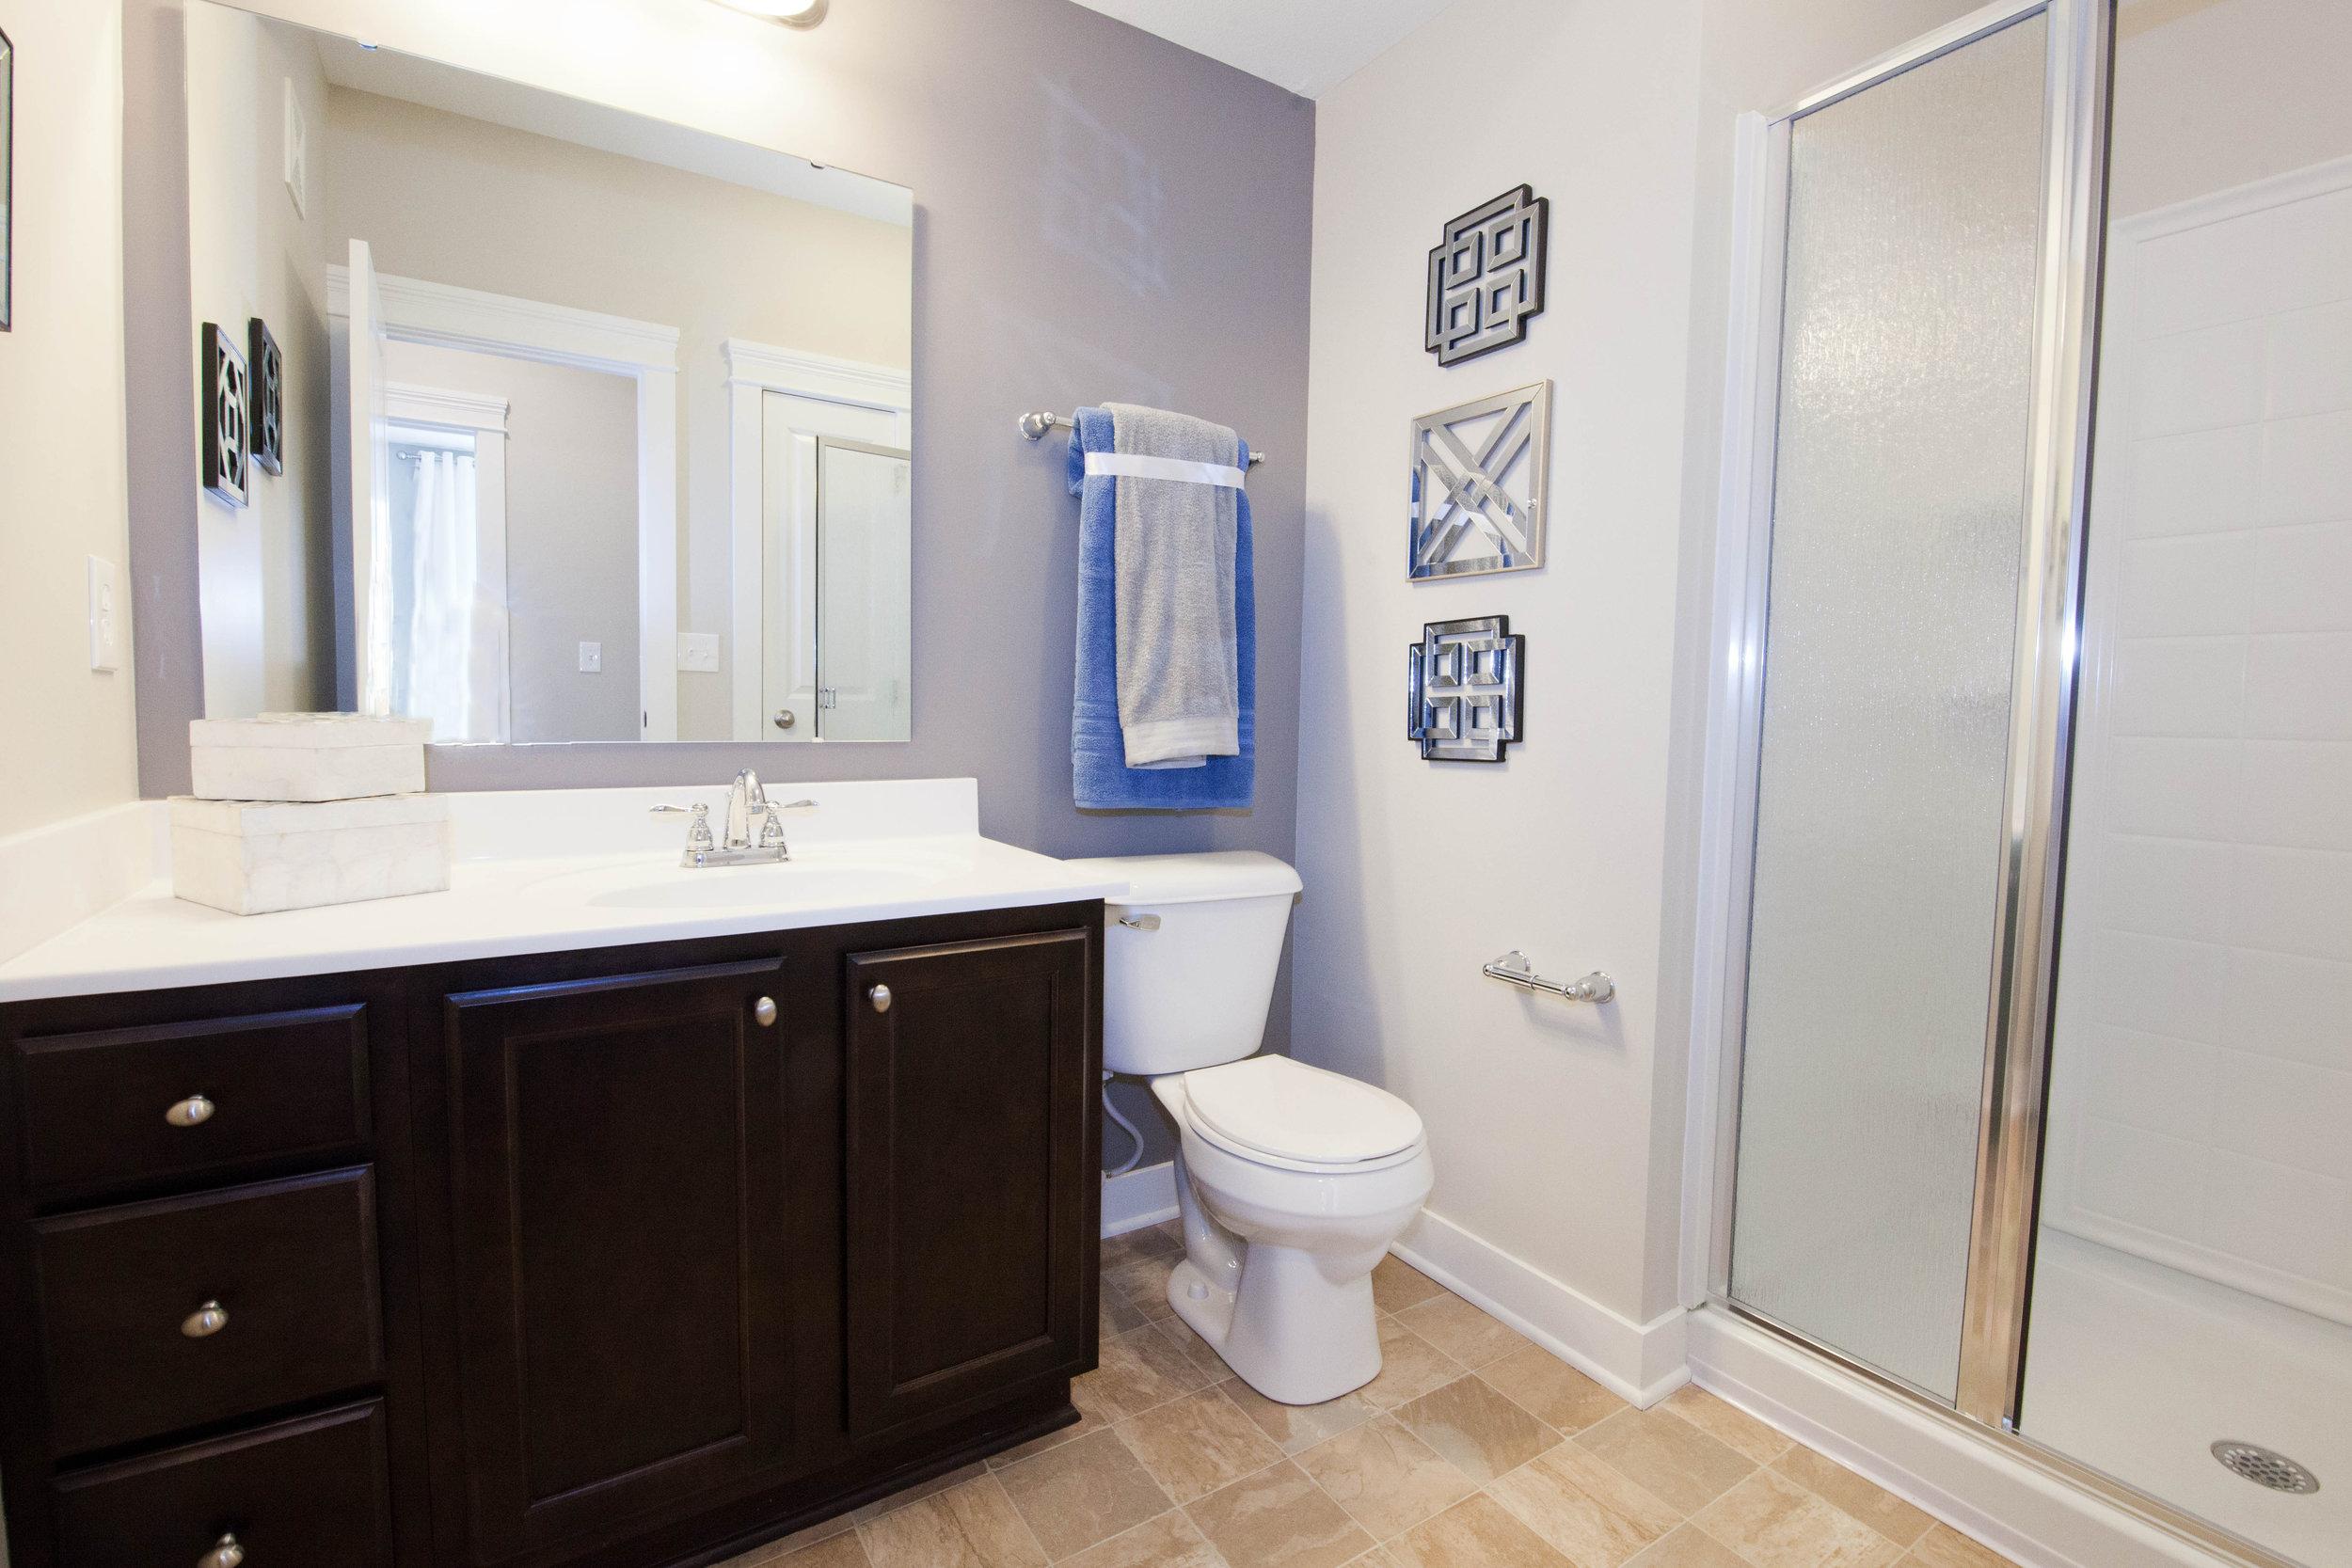 Highpointe - Model bathroom 1 (apartment).JPG